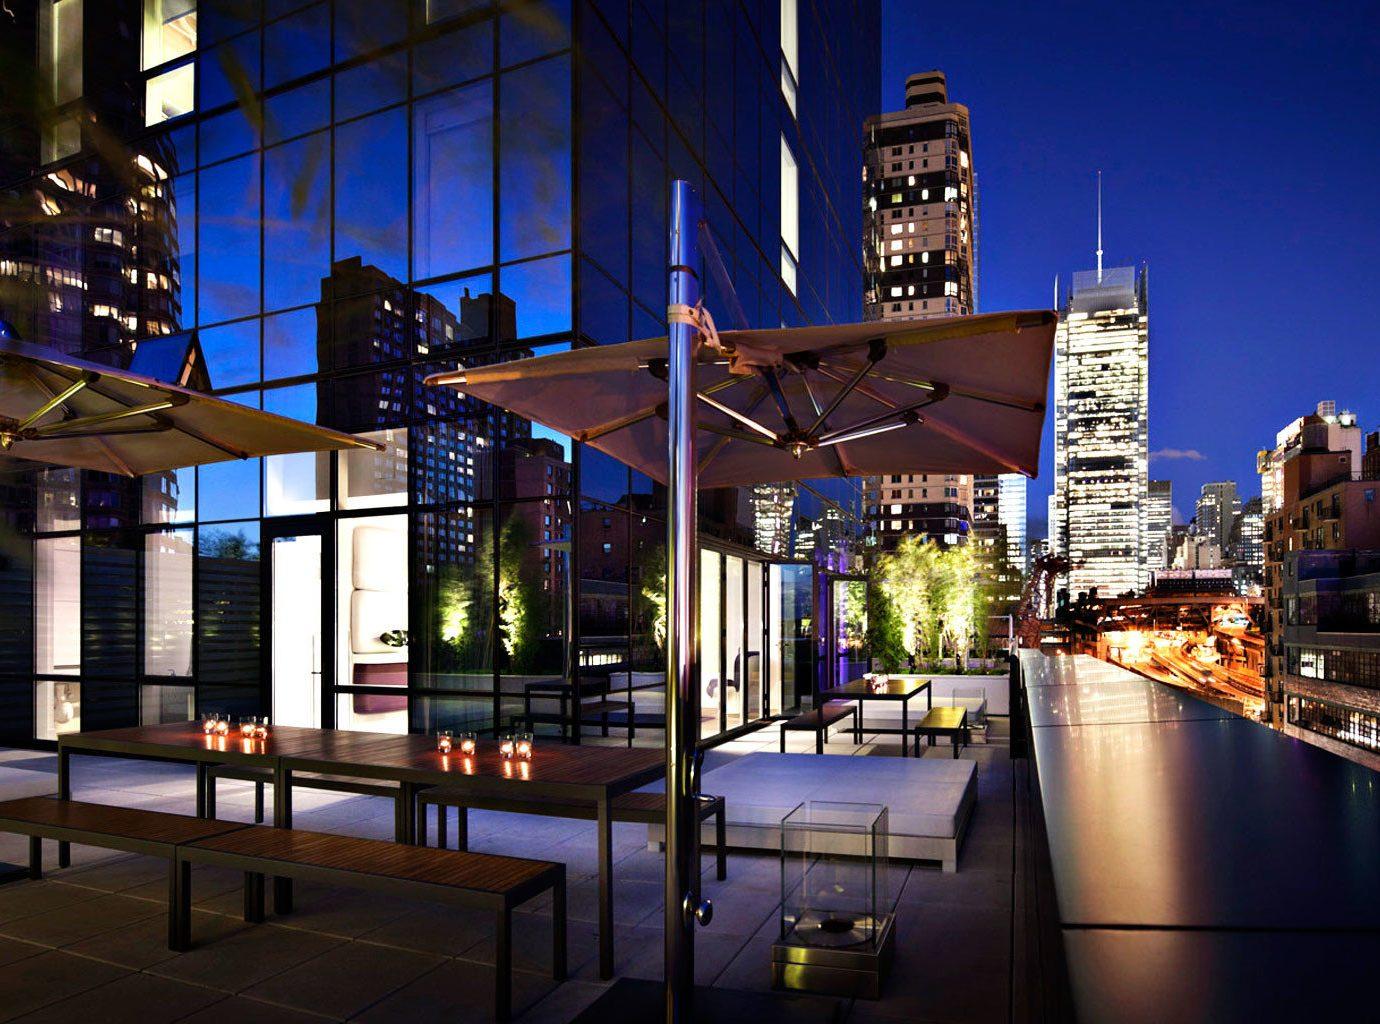 Architecture Budget Buildings City Exterior Rooftop Scenic views building metropolitan area night metropolis urban area landmark human settlement cityscape Downtown evening reflection